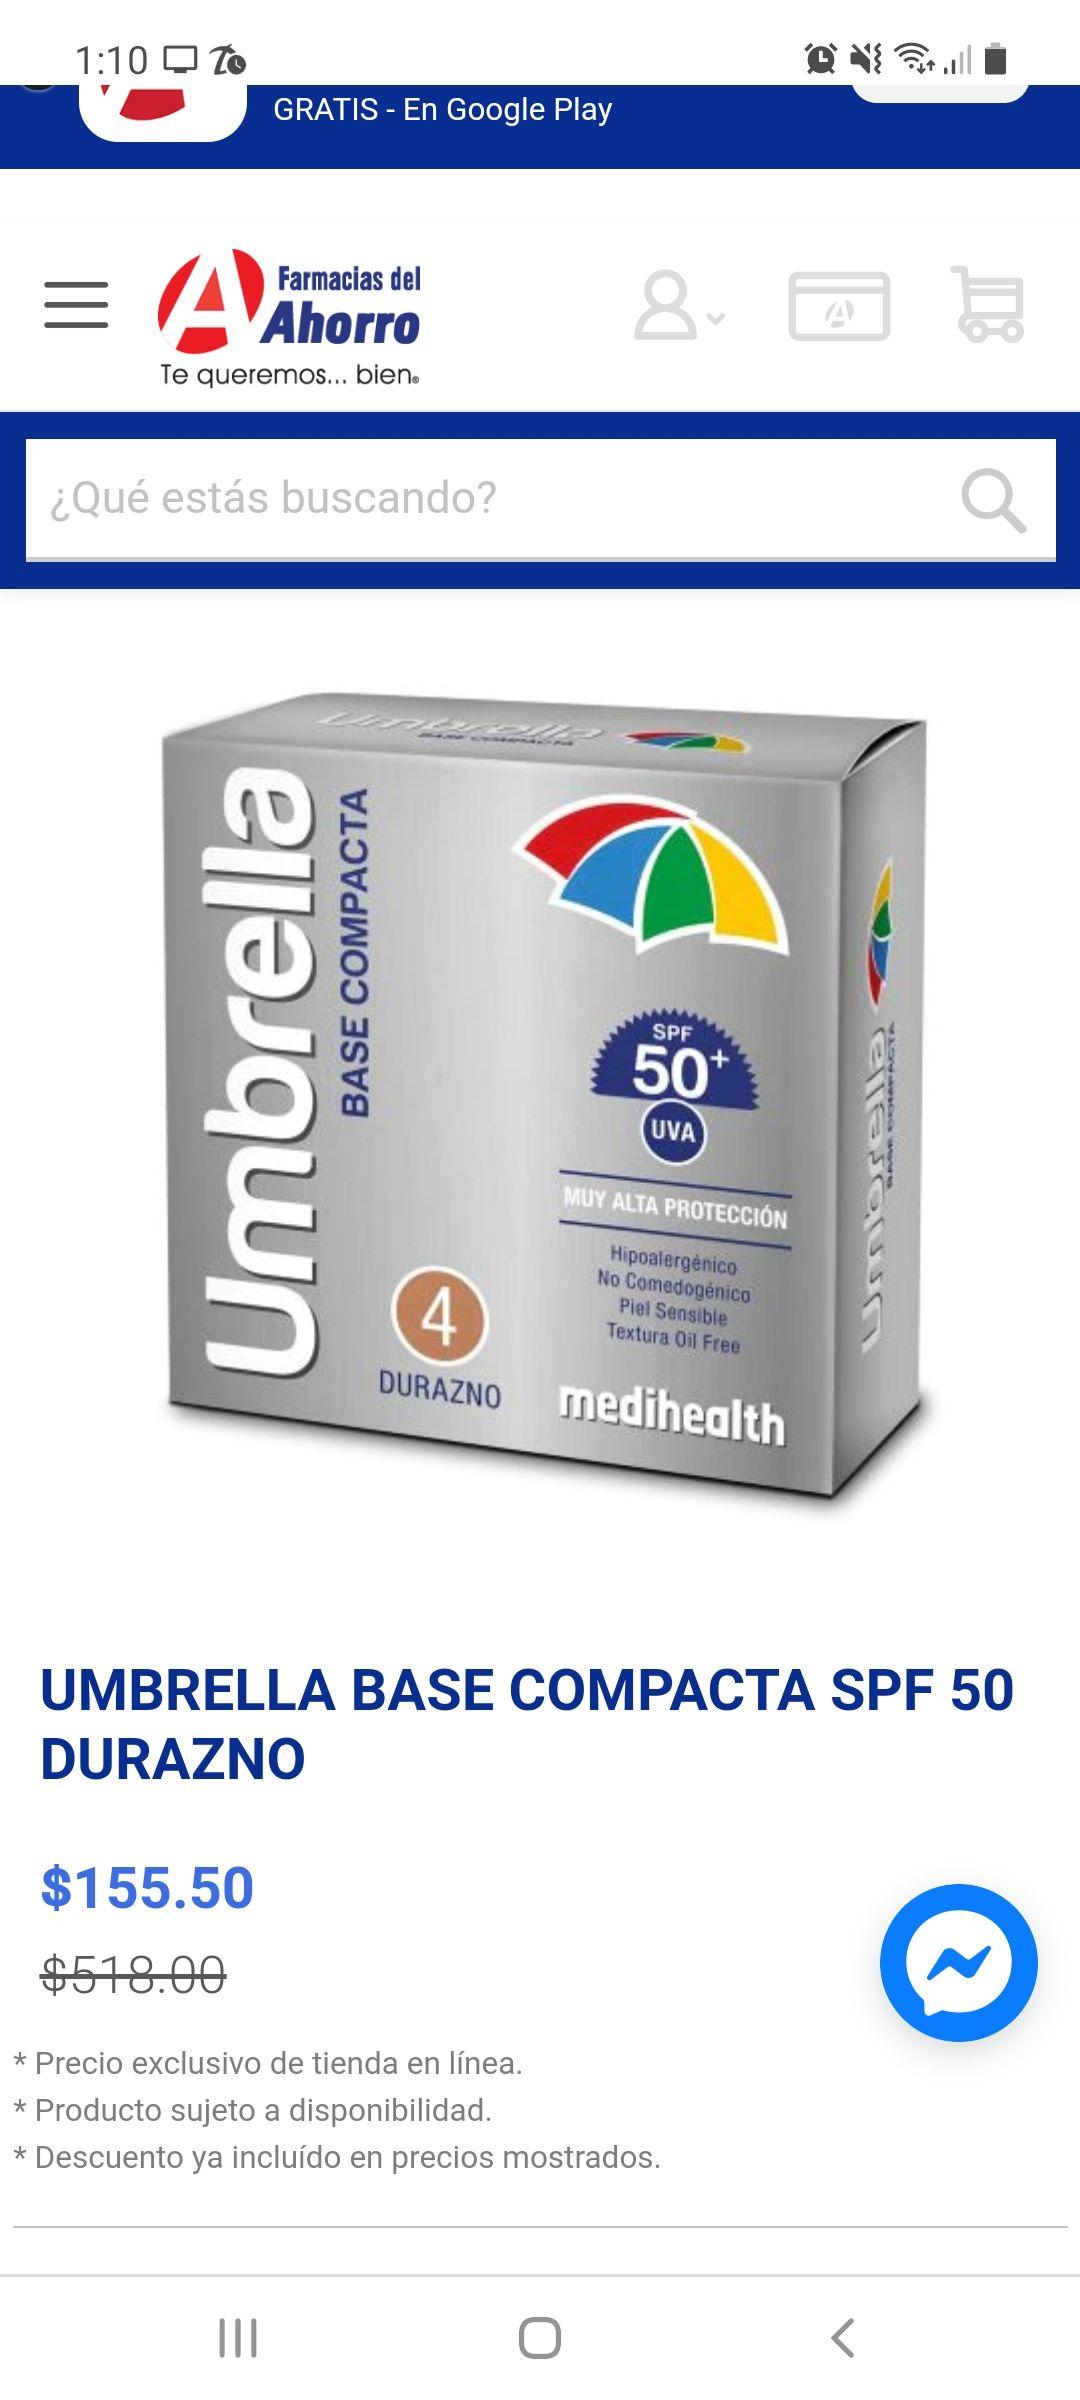 UMBRELLA BASE COMPACTA SPF 50 DURAZNO farmacia del ahorro